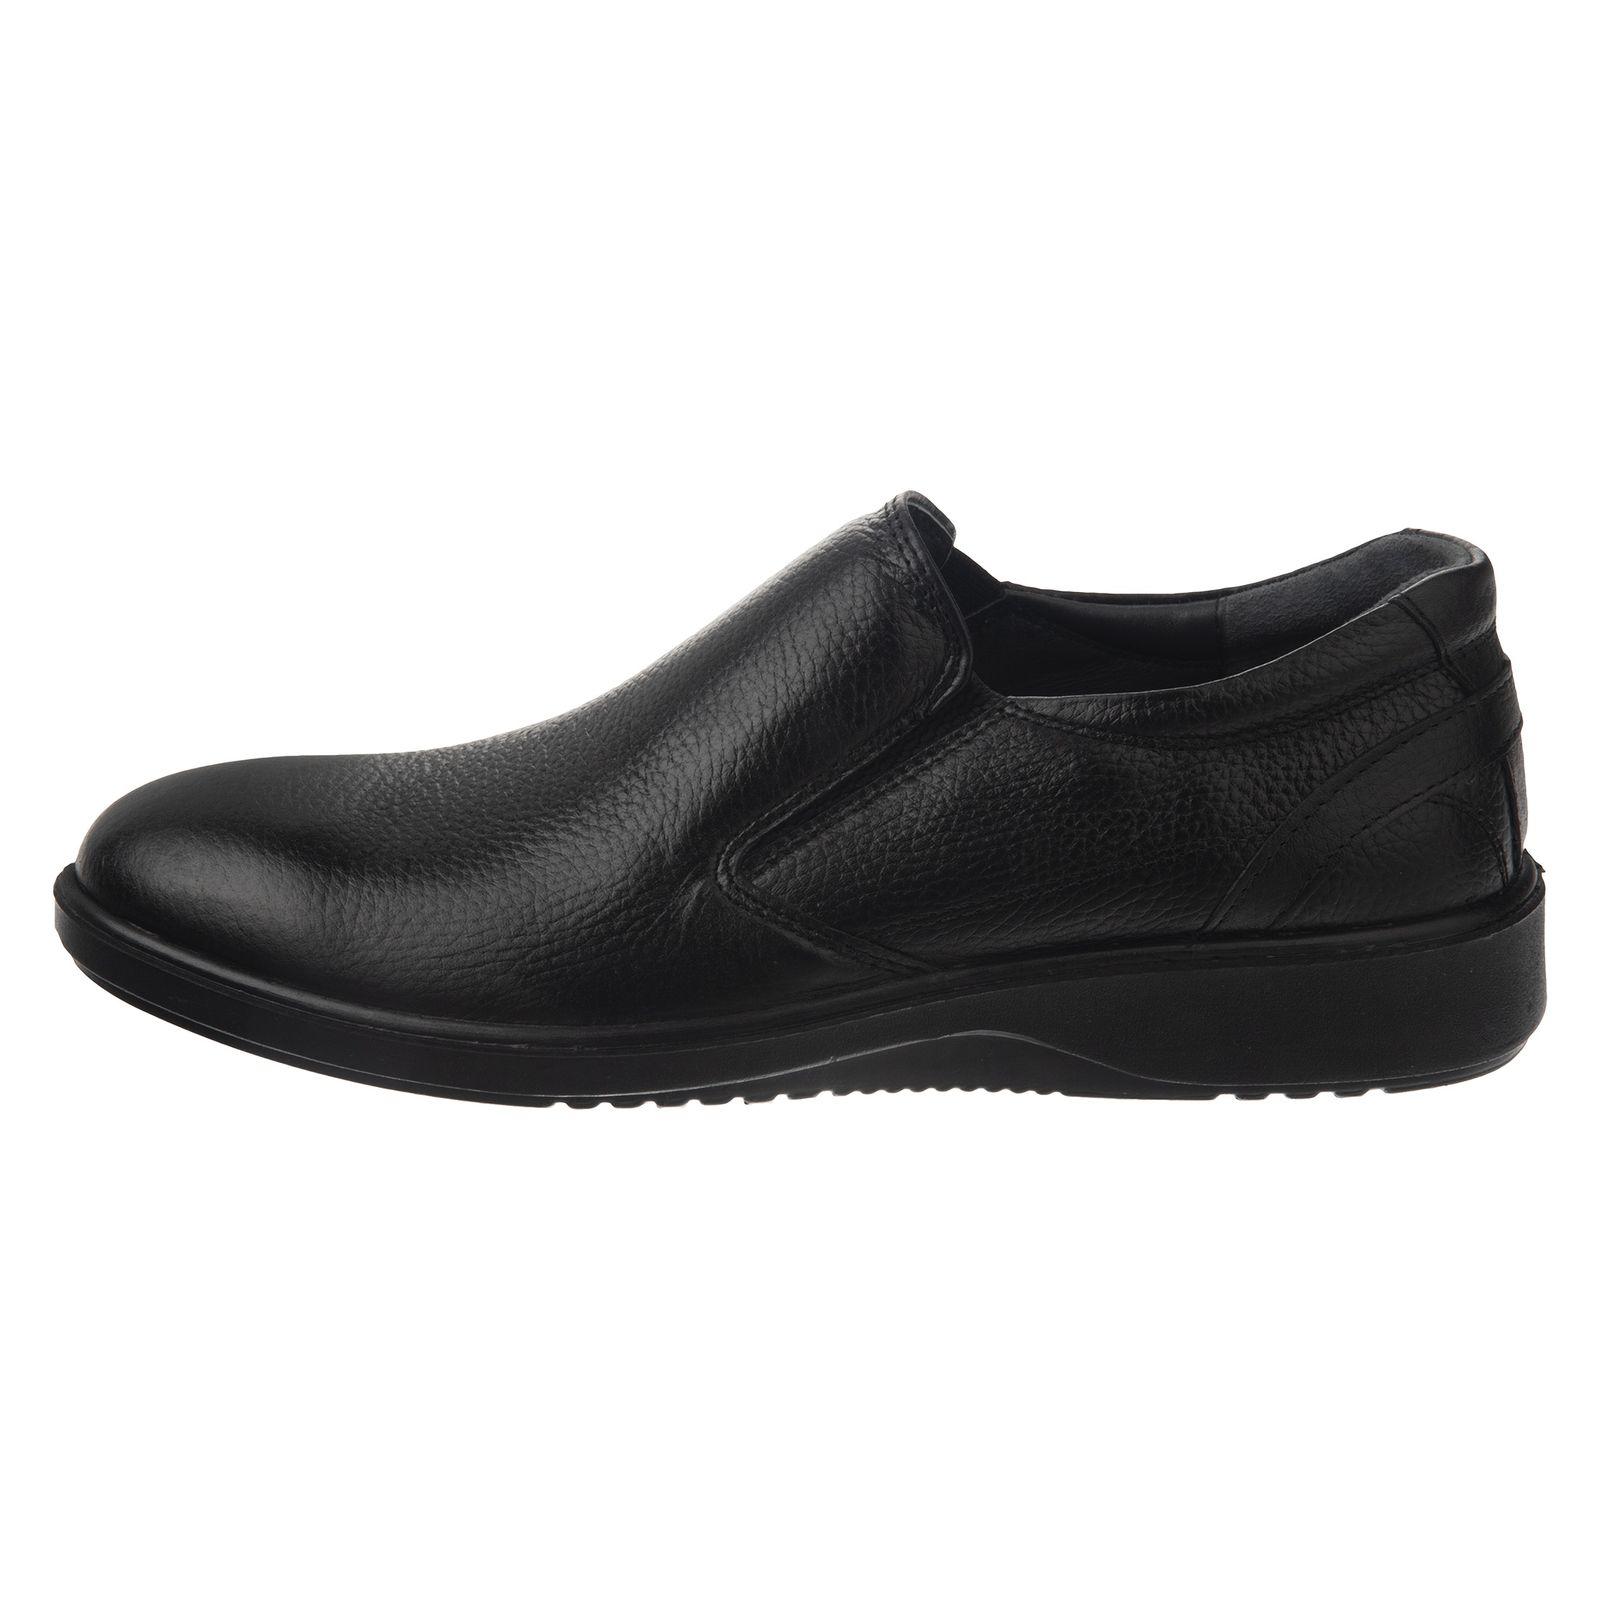 کفش روزمره مردانه شیفر مدل 7216A-101 - مشکی - 2